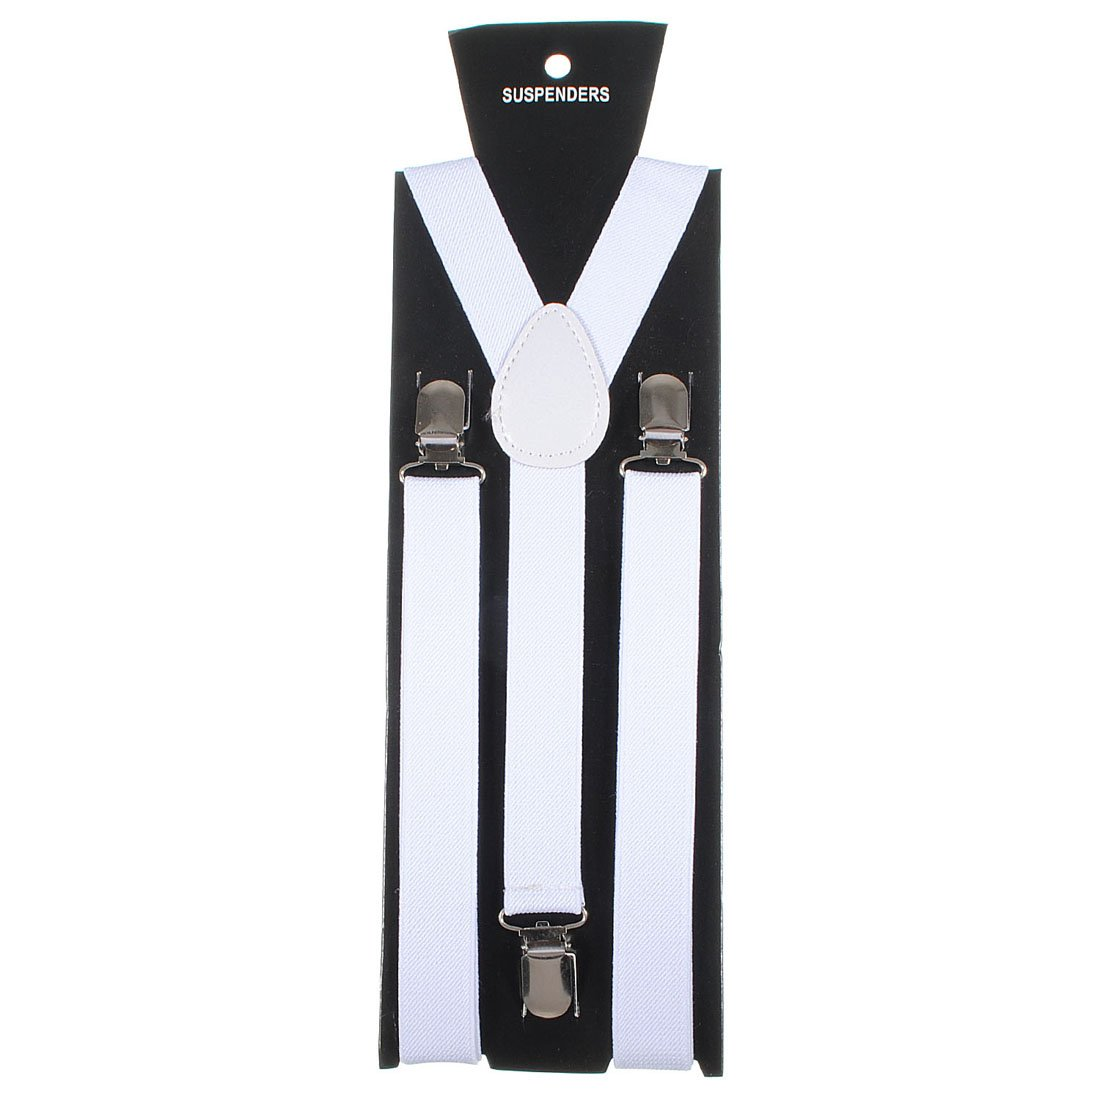 Adjustable Unisex Adult Child Elastic Clip-on Brace Suspender Y back Neon Belt, White homeking Co. LTD